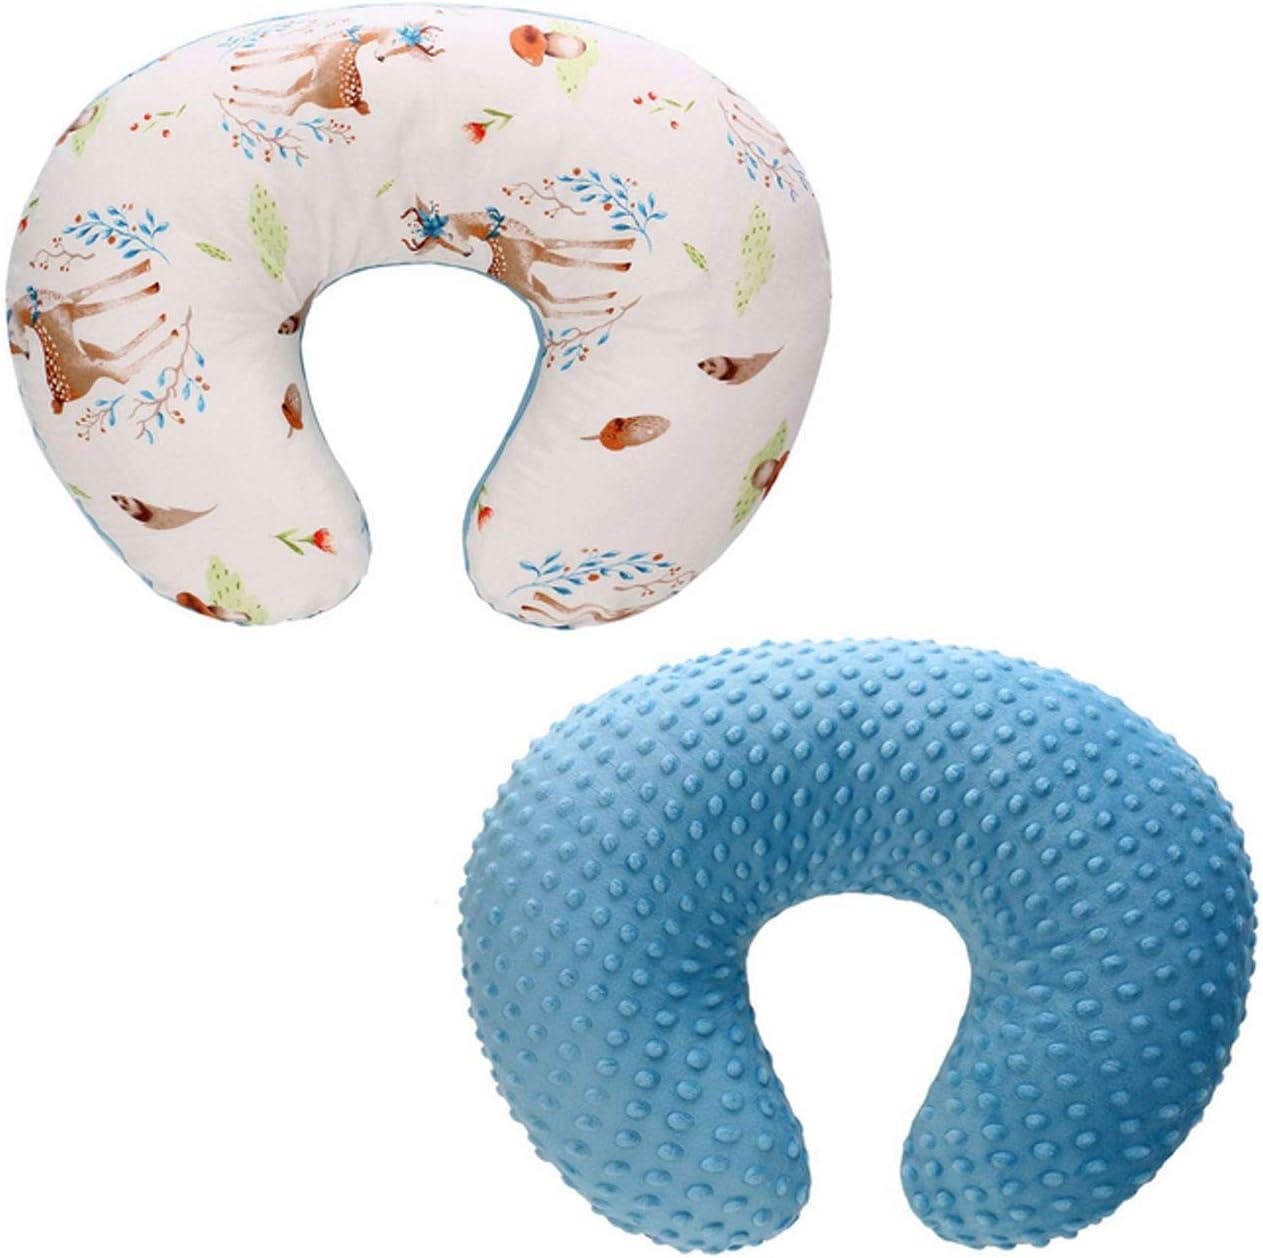 Nursing Pillow Covers,Gosear Cotton Plush U-Shape Nursing Pillow for Breastfeeding Infant Newborn Babies